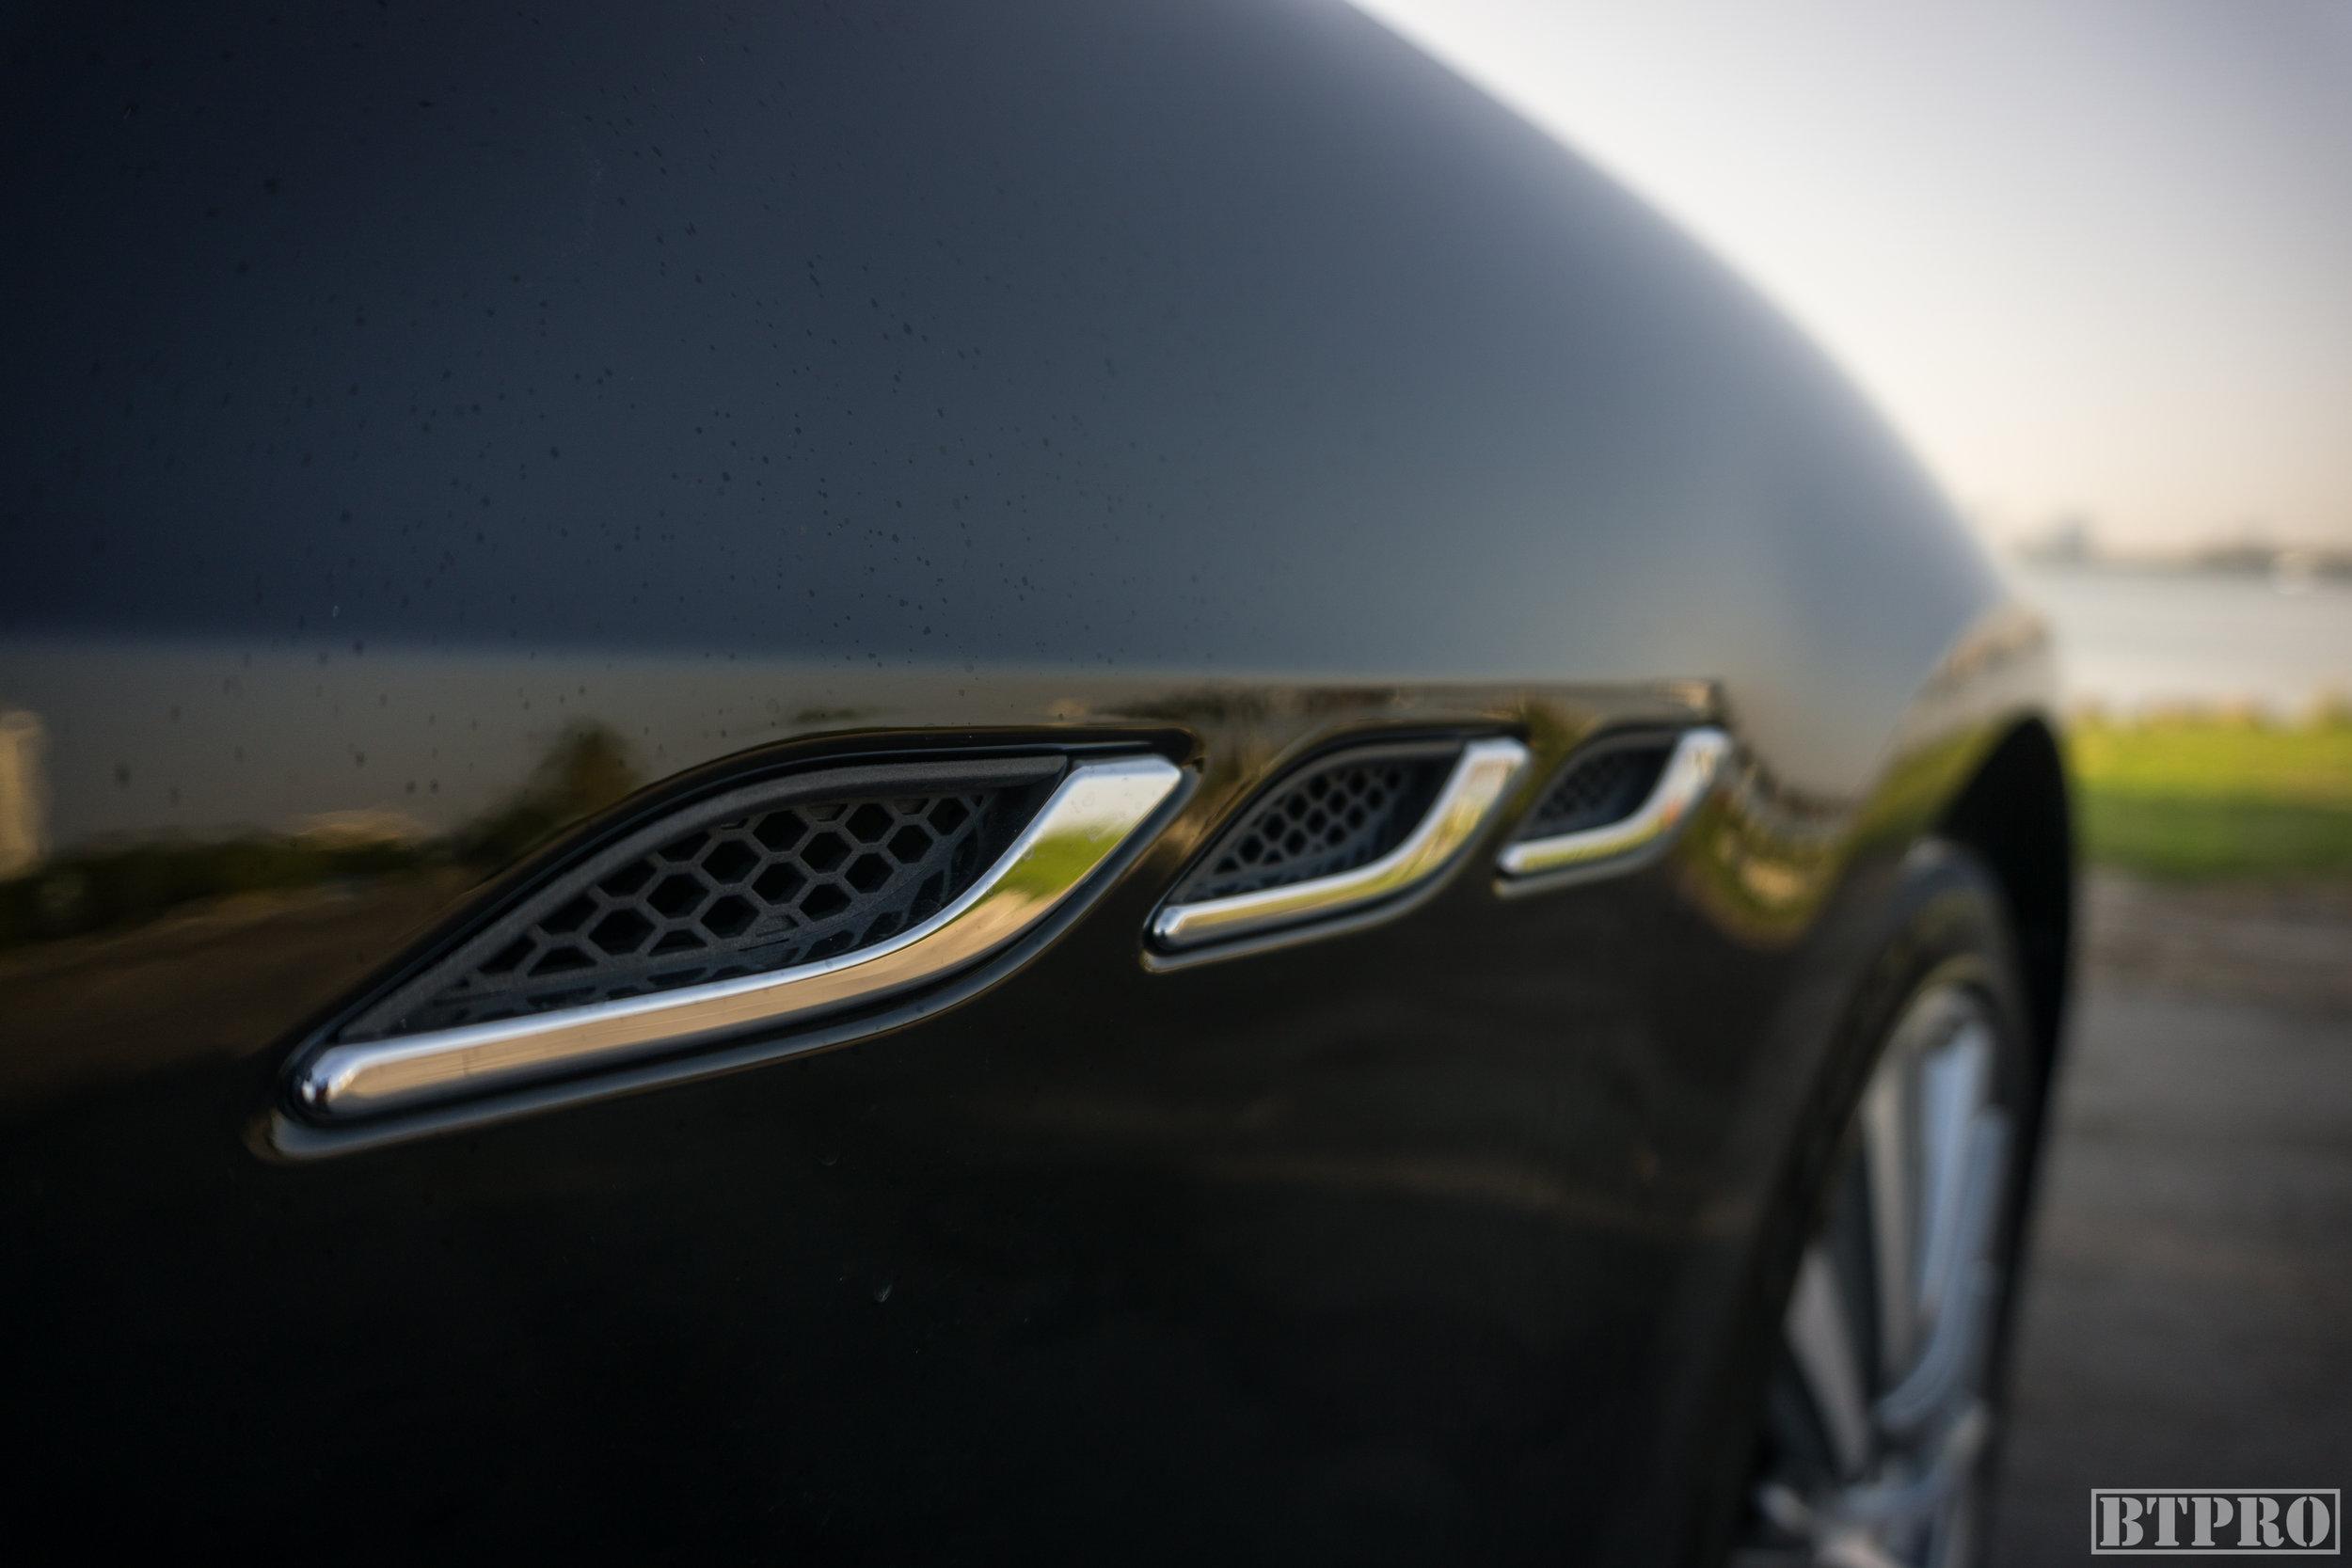 cars, car photo, car photography, maserati, italian cars, miami, miami photographers